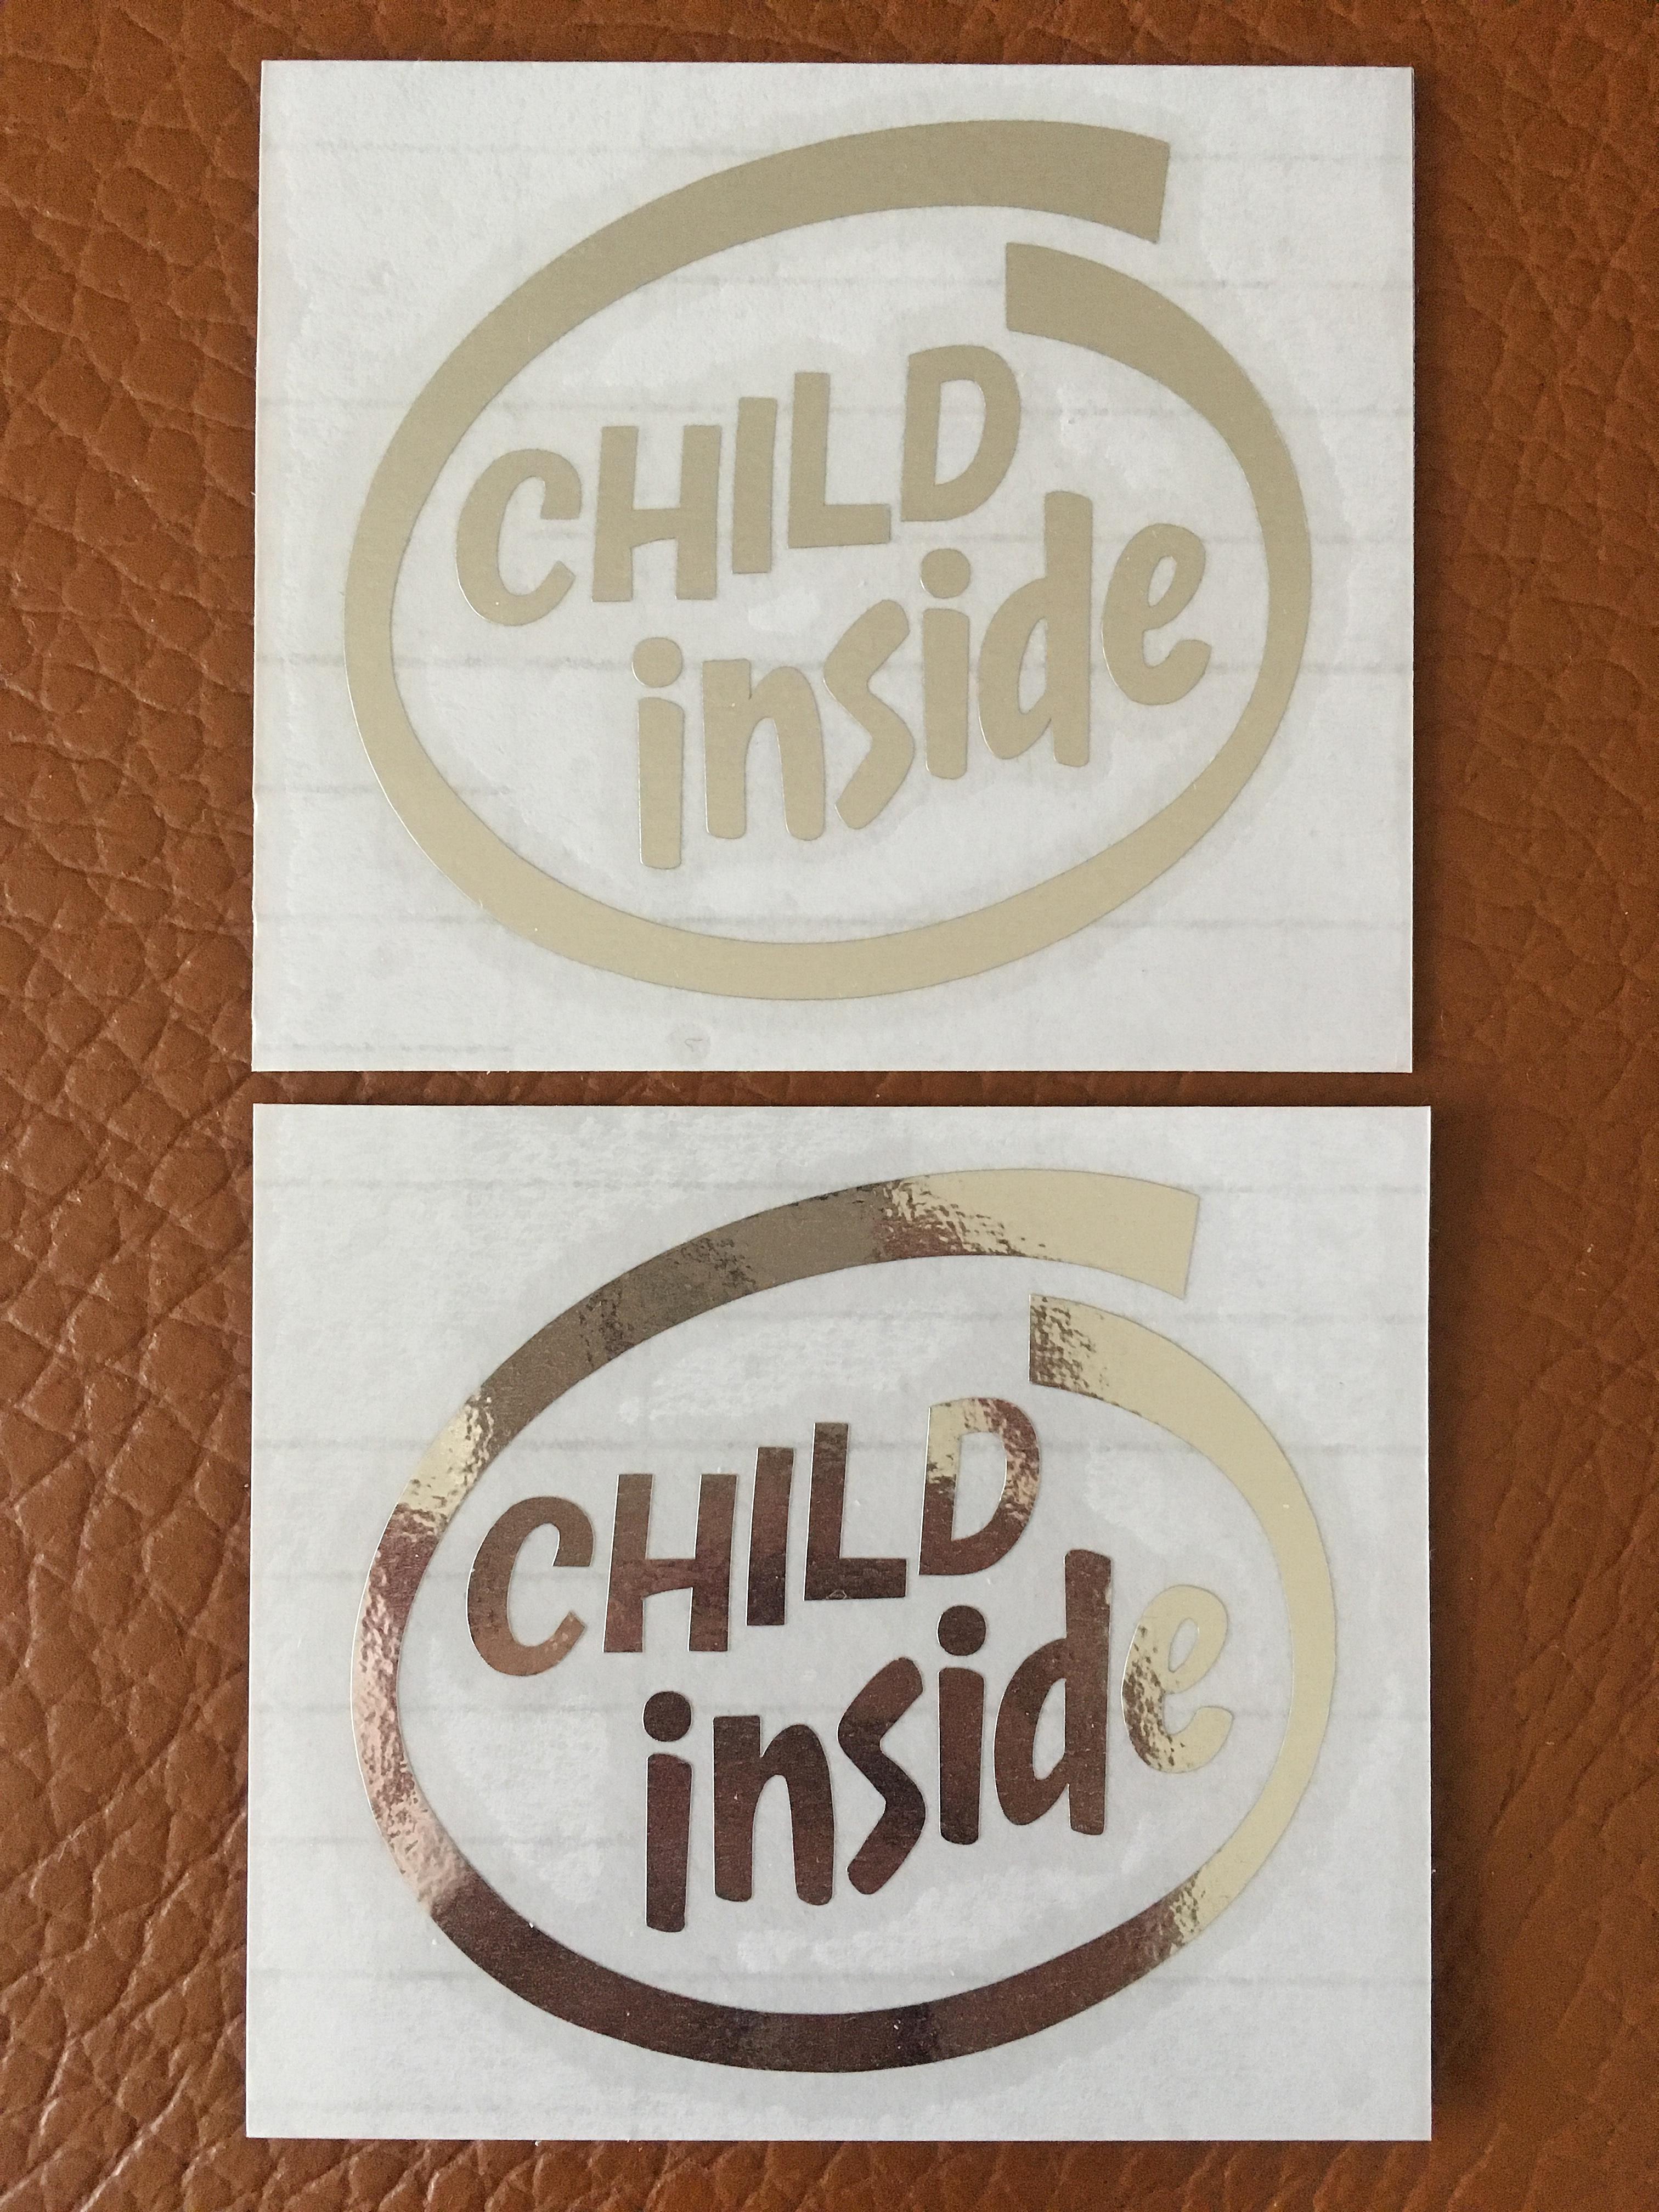 CHILD inside ステッカー.JPG